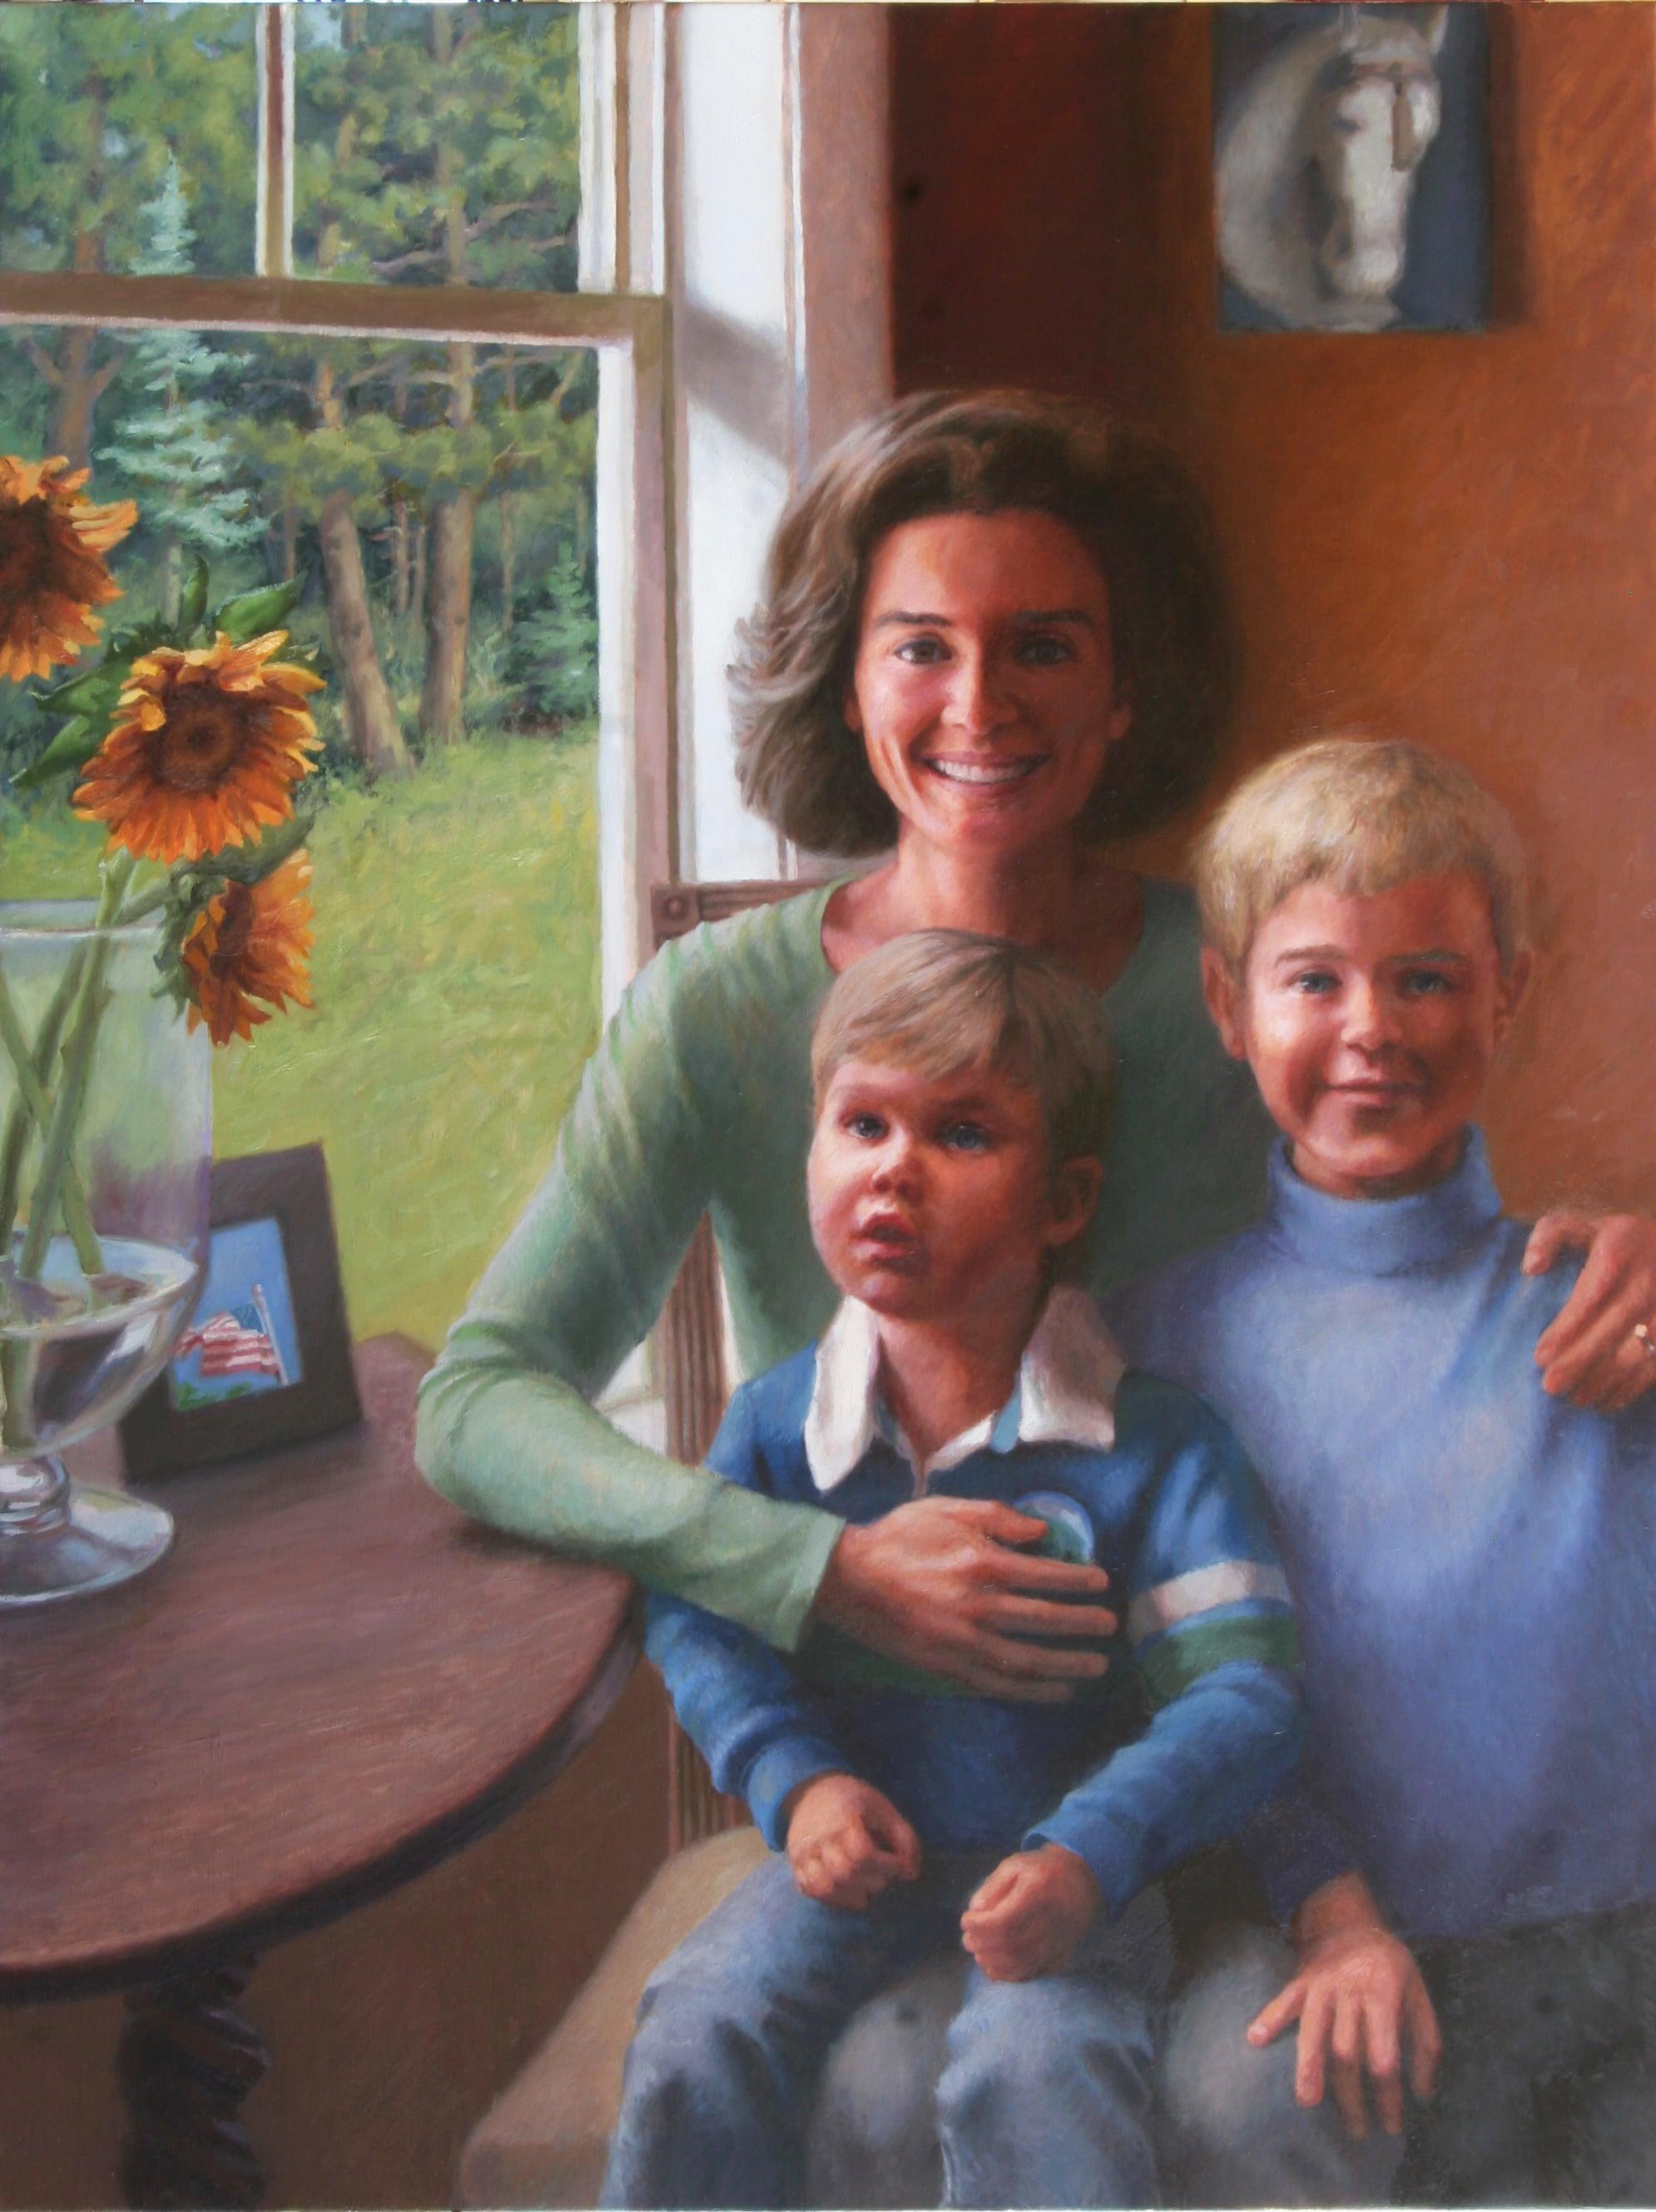 Portrait painting, Final. Minneapolis, Minnesota painter Jeffrey Smith